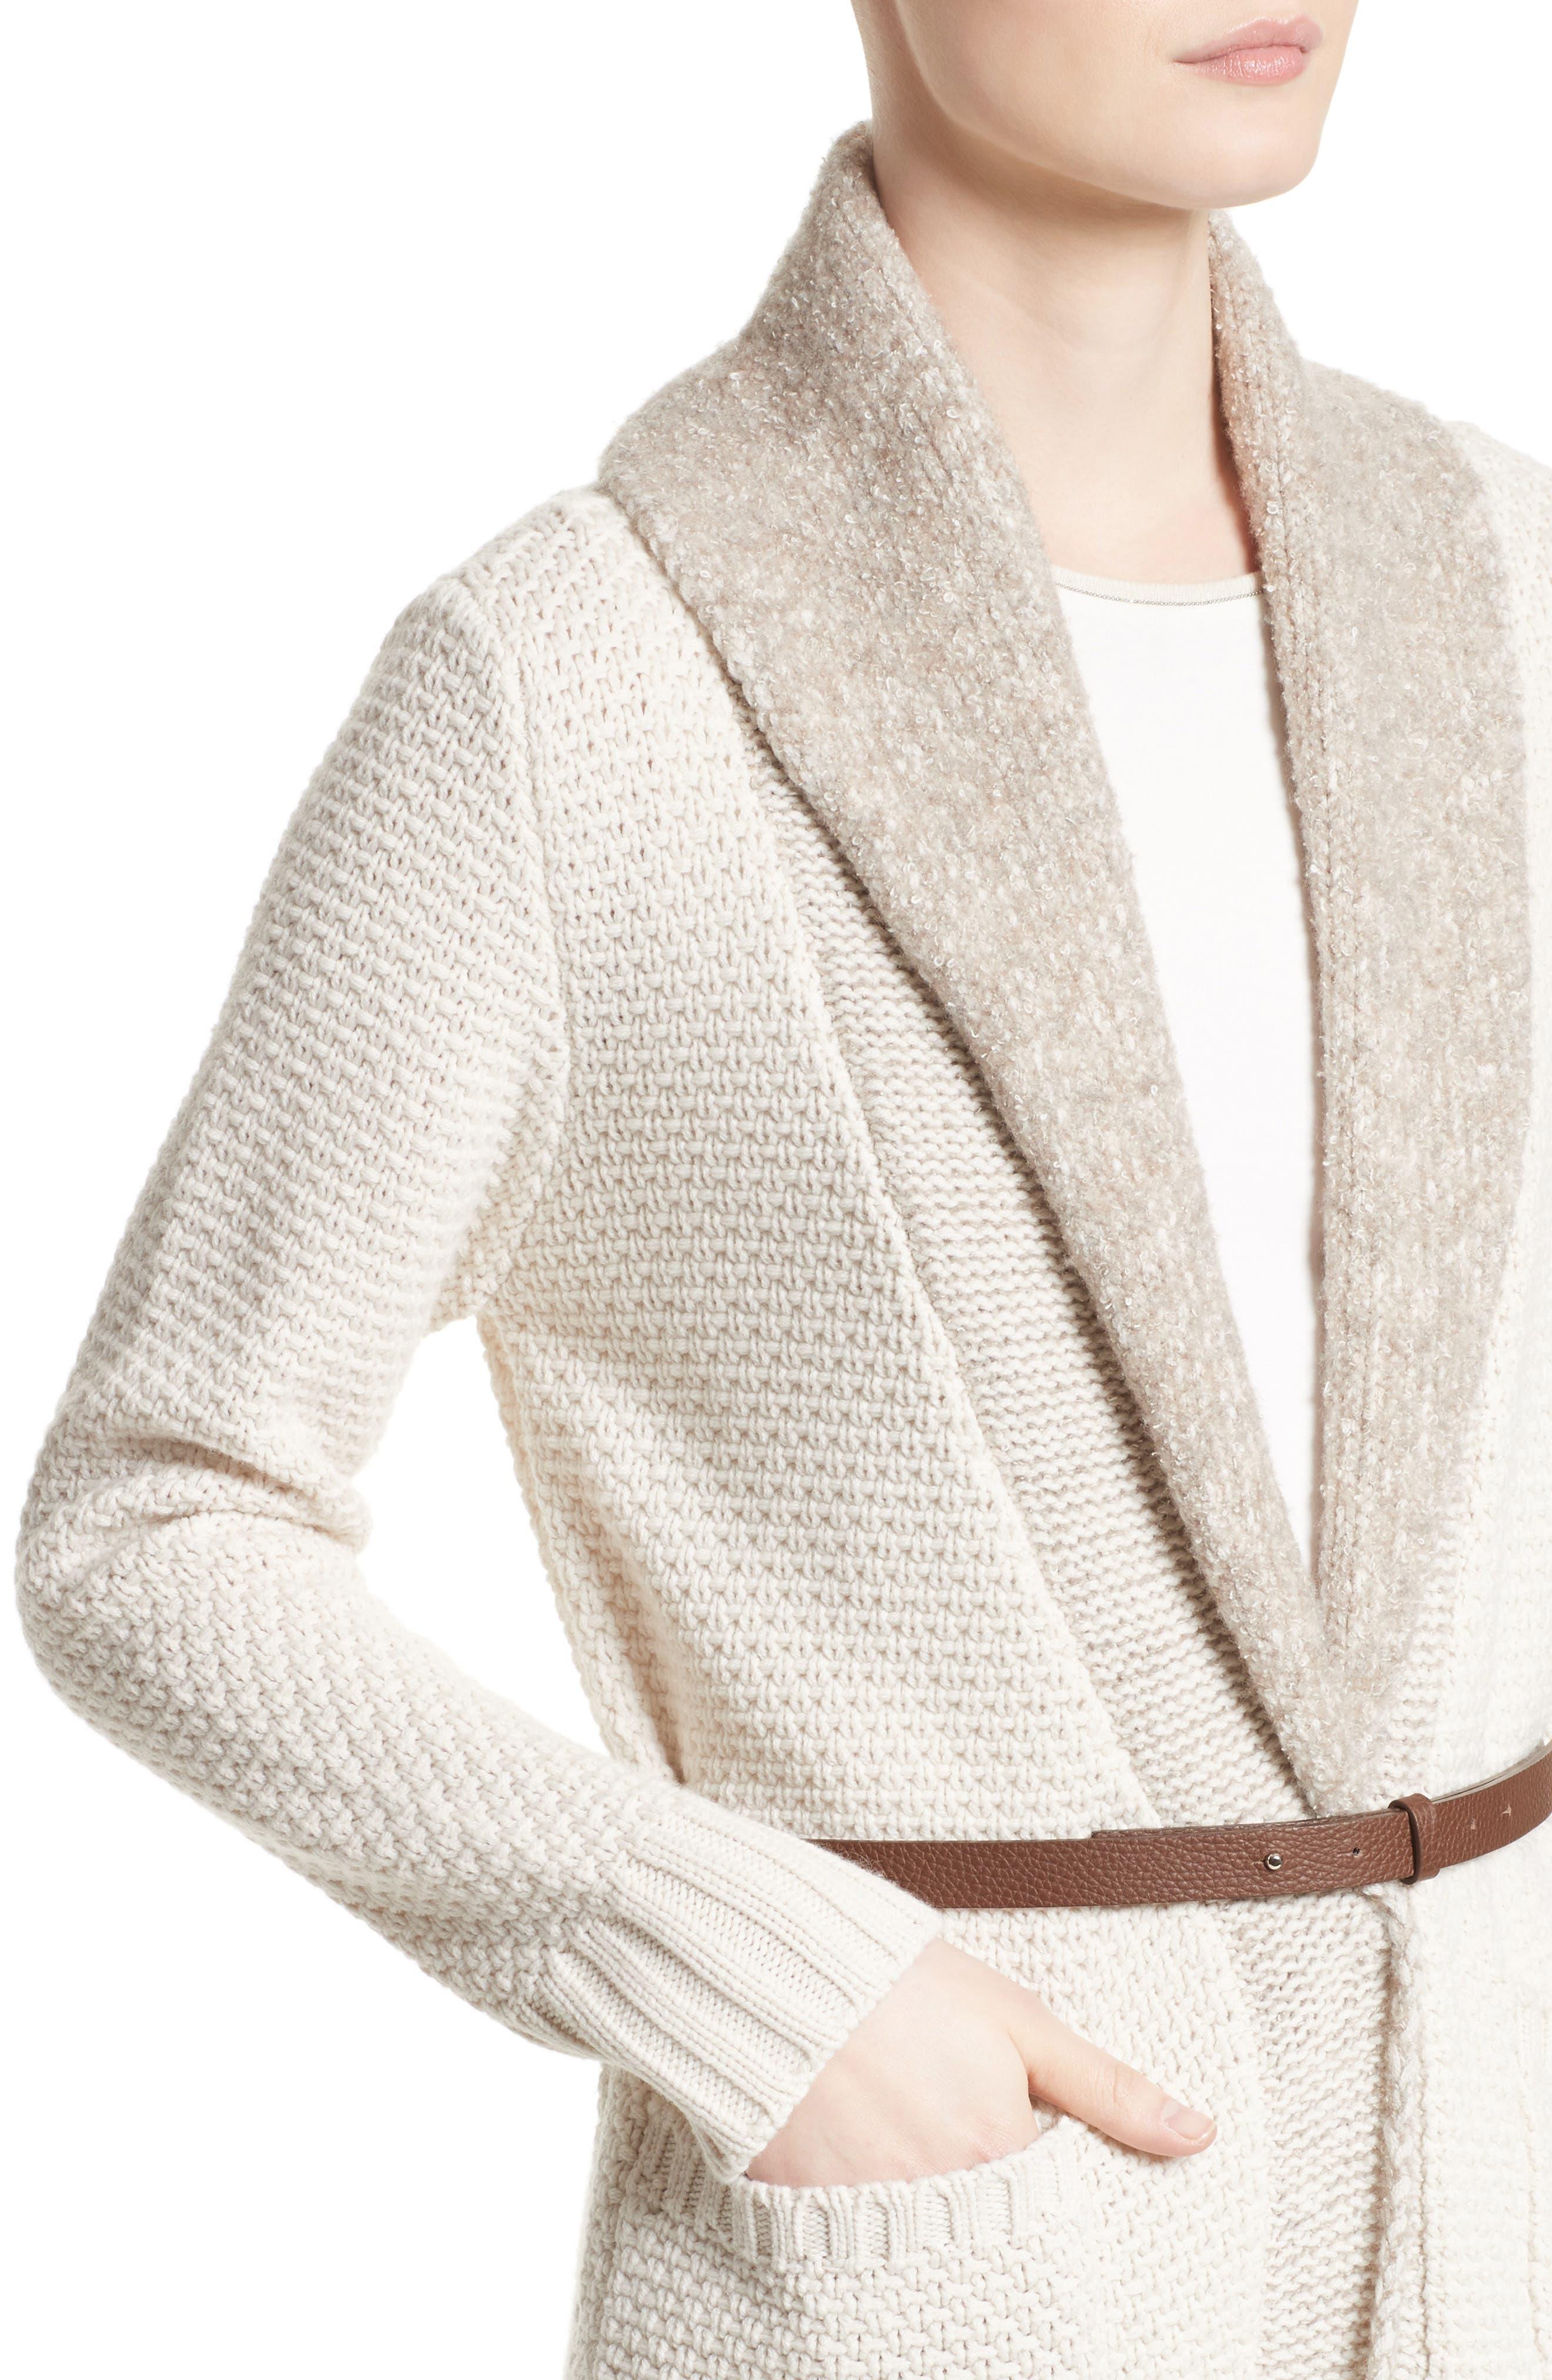 Wool, Silk & Cashmere Knit Cardigan,                             Alternate thumbnail 4, color,                             101